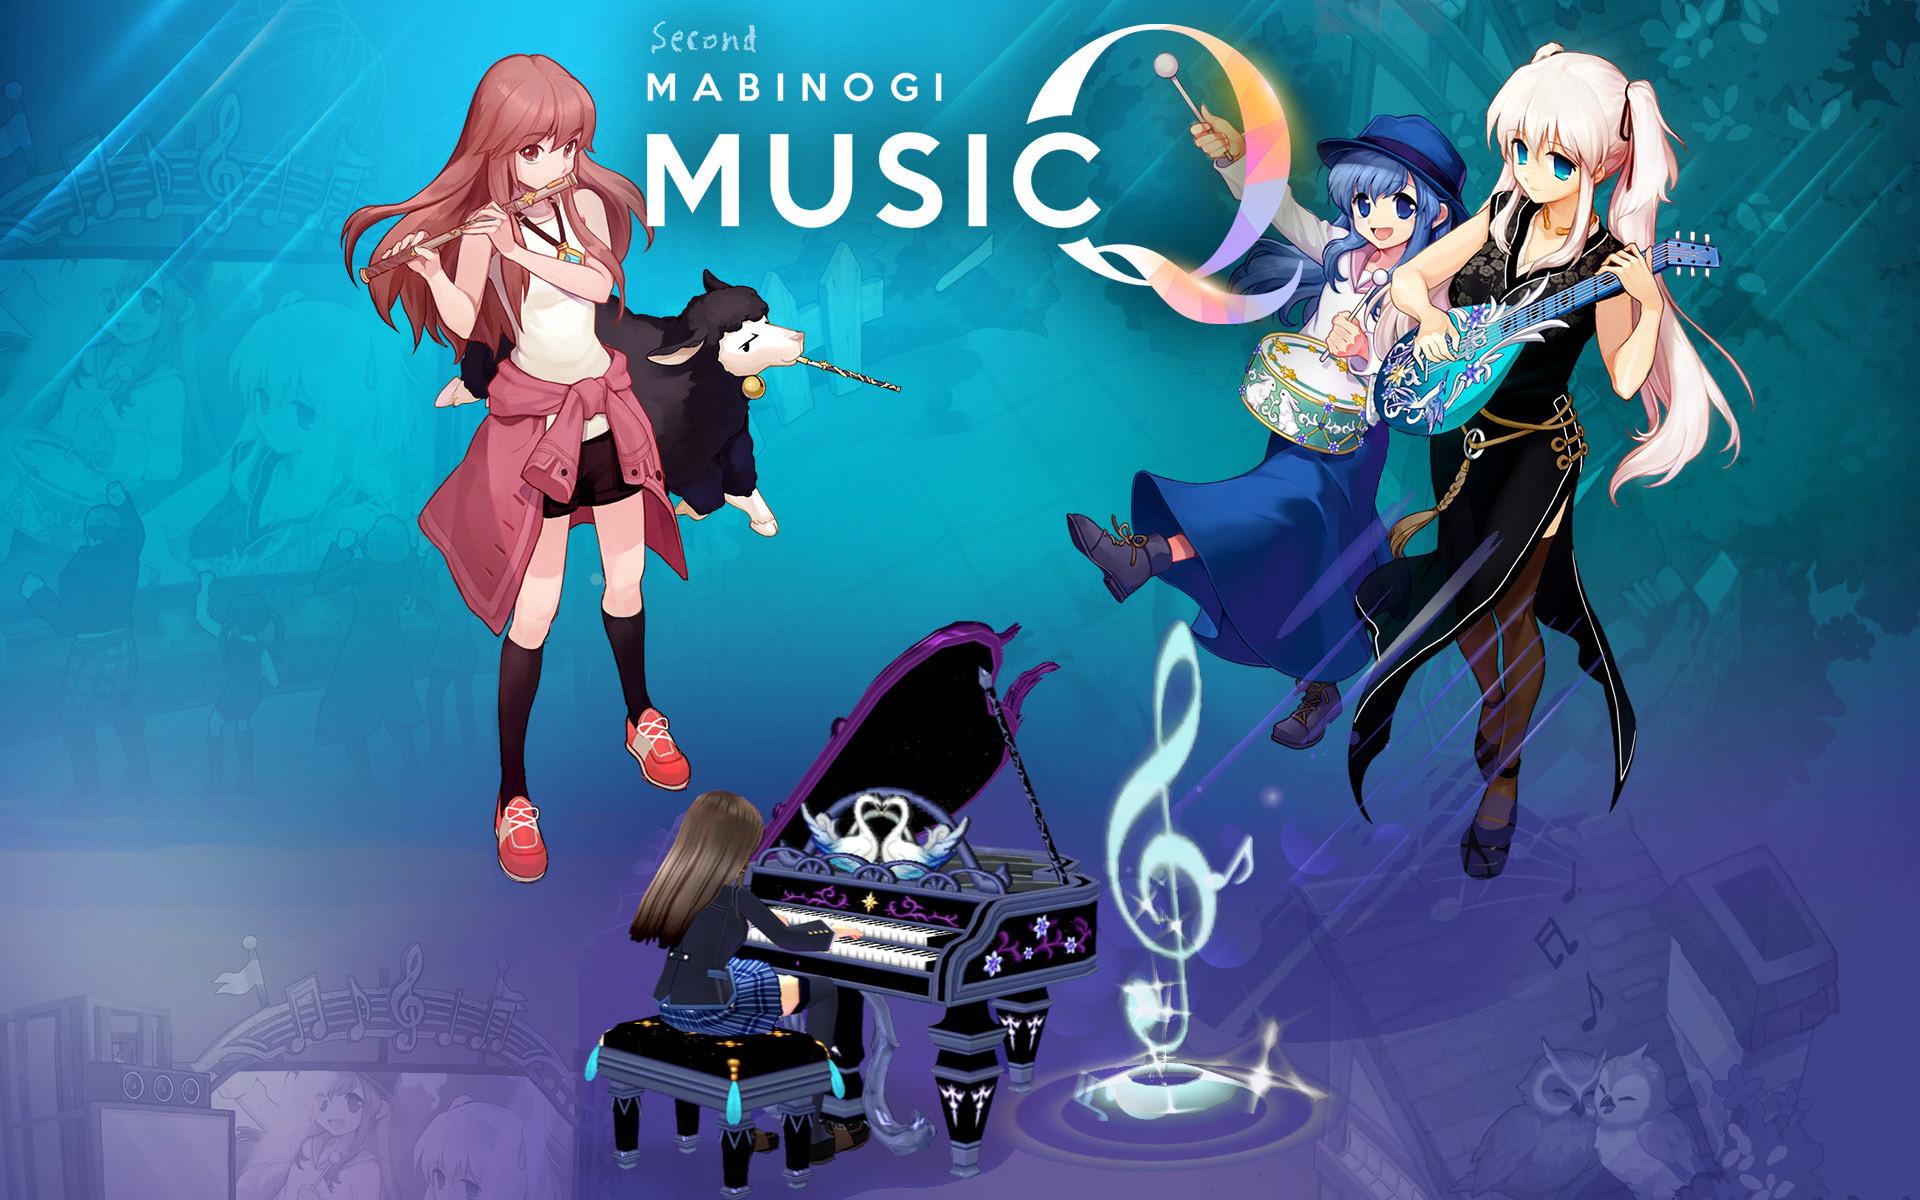 MusicQ-2nd壁紙-5